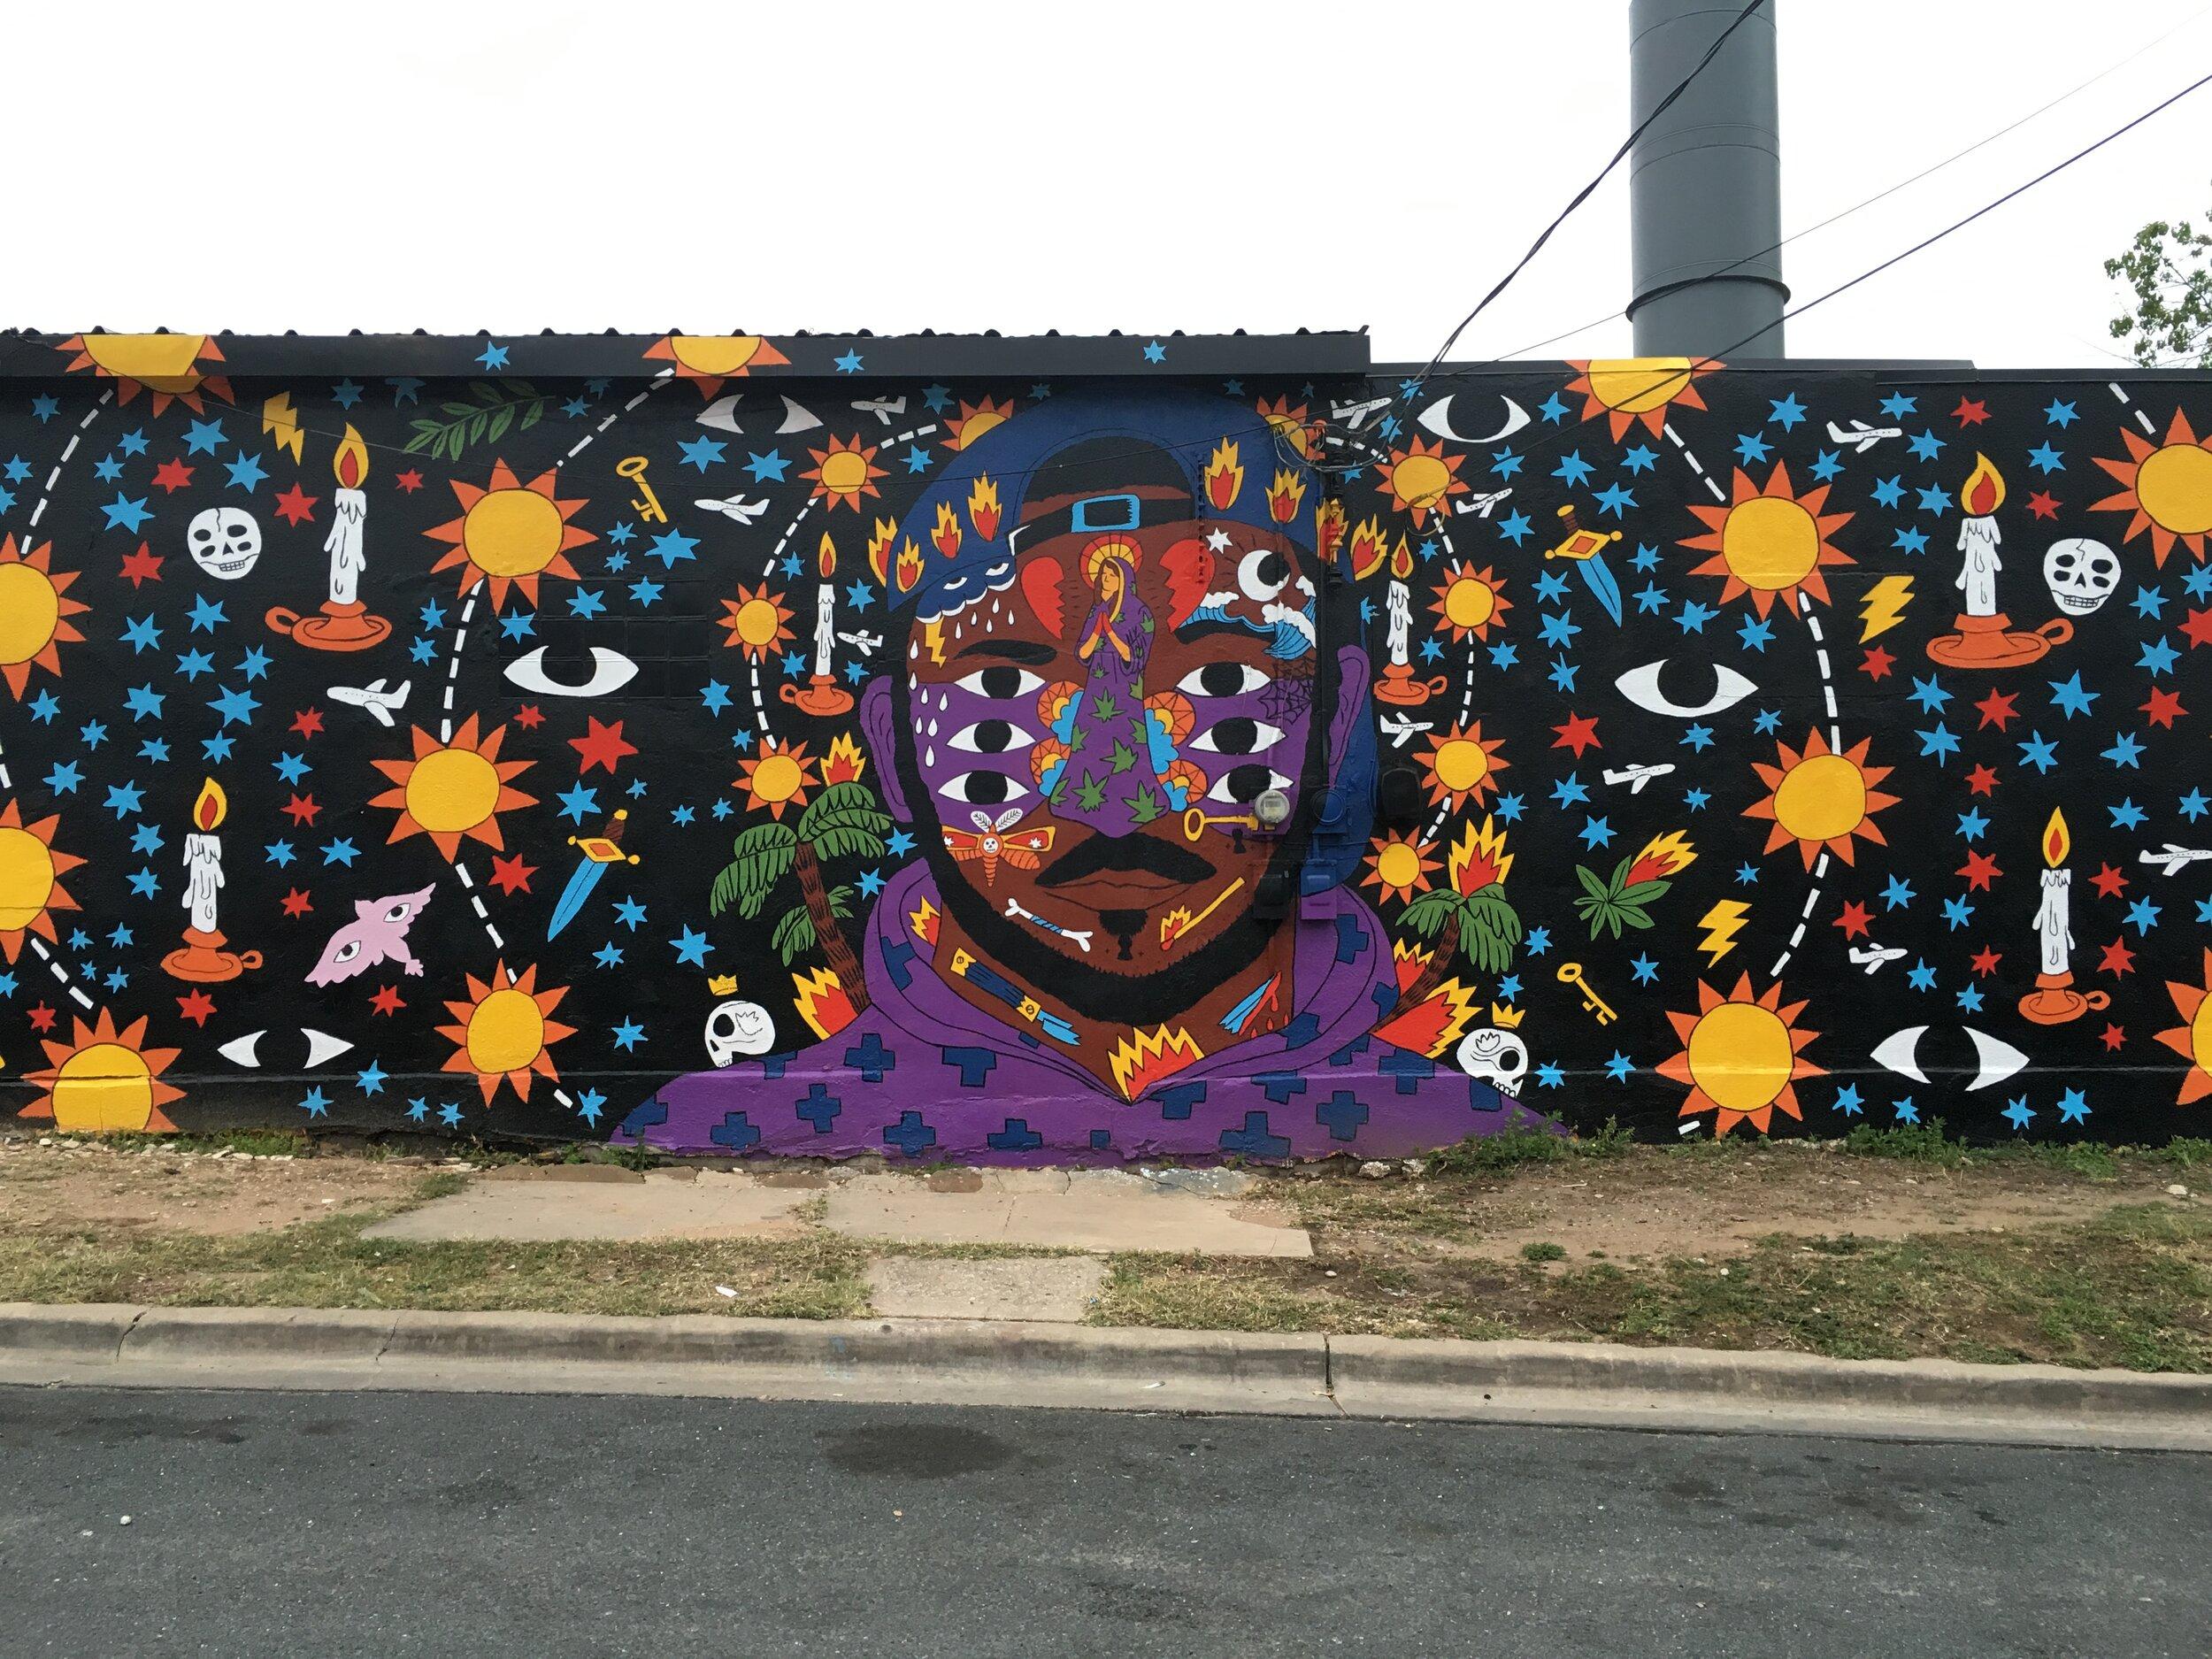 Kaytranada Album Cover Mural, SXSW Austin